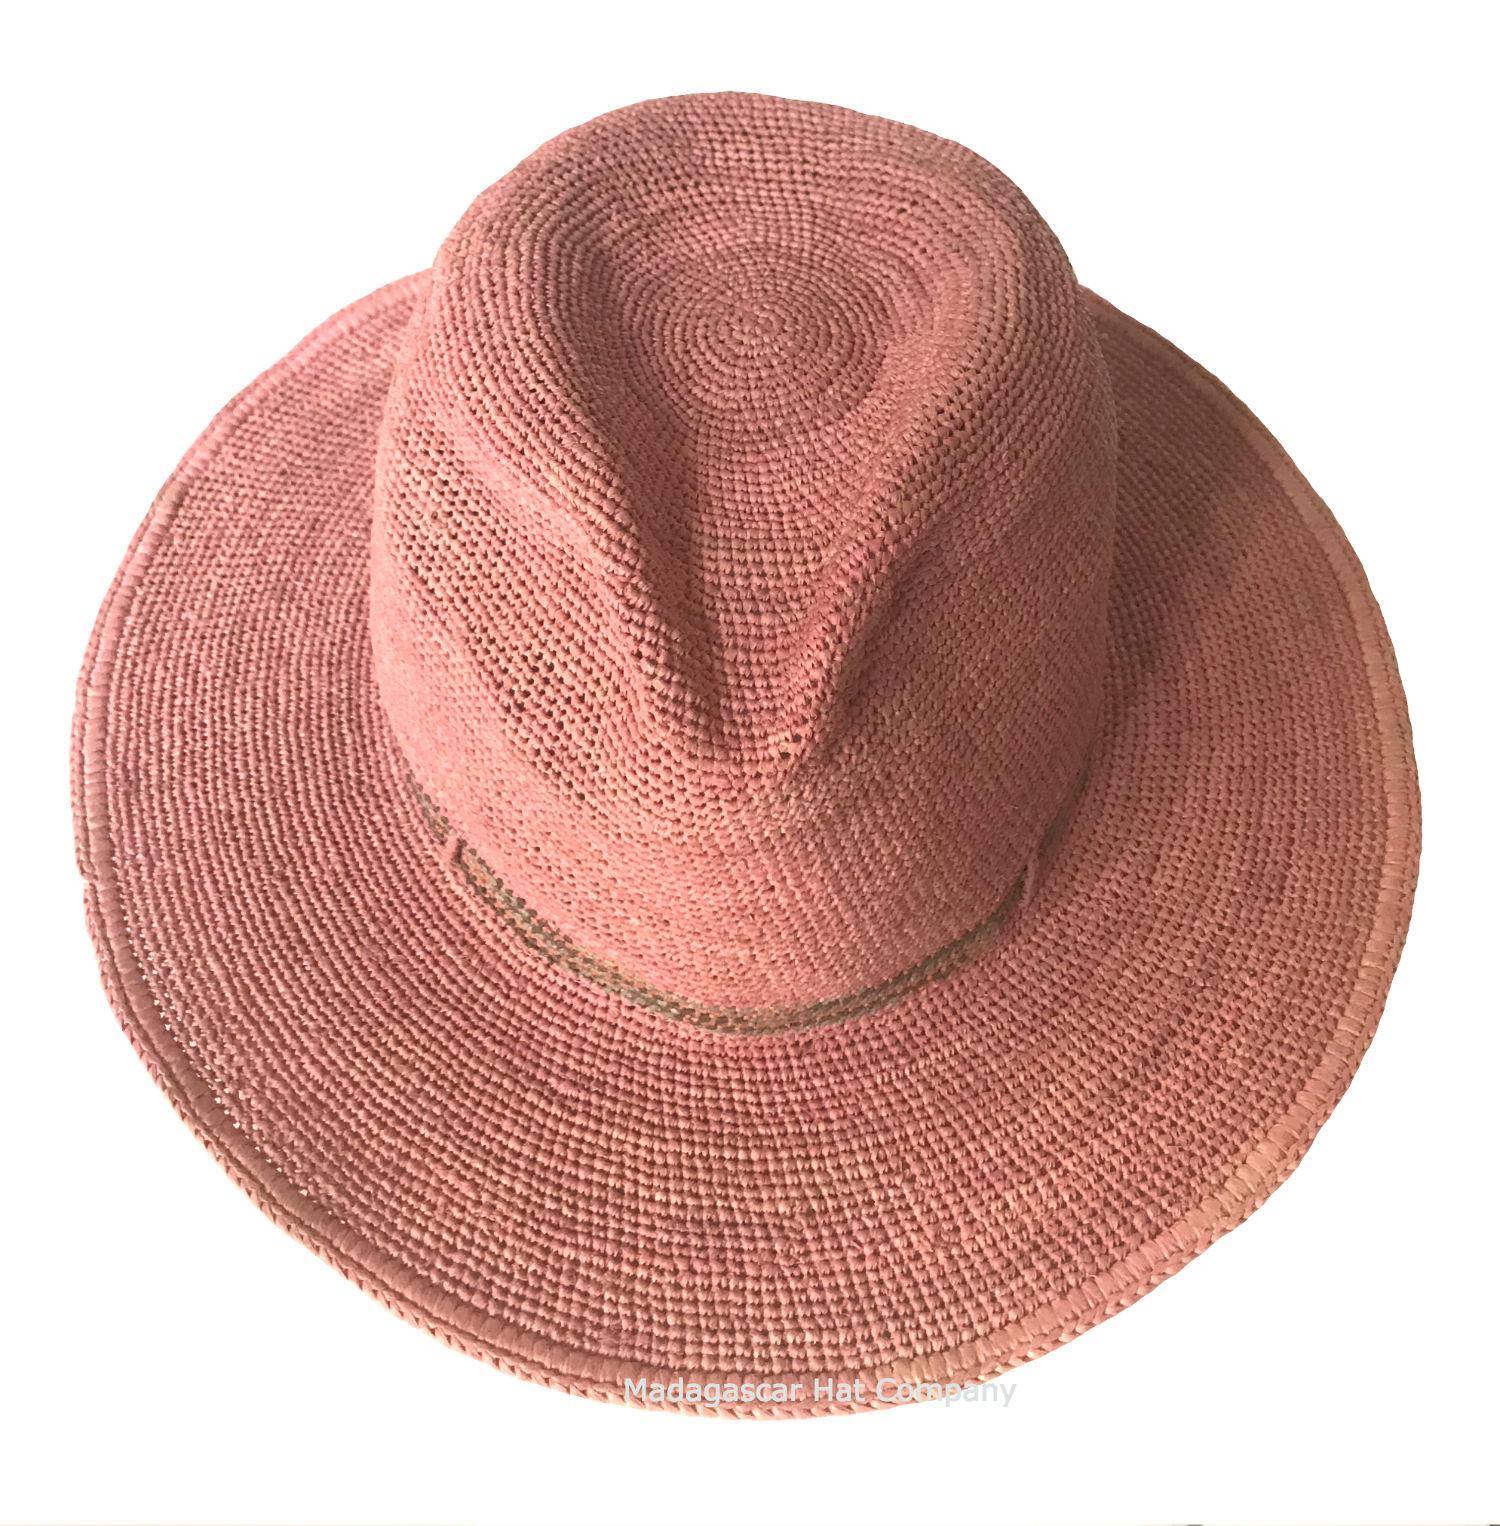 677a654d6 BARAH 7 - Dusty Pink Multi